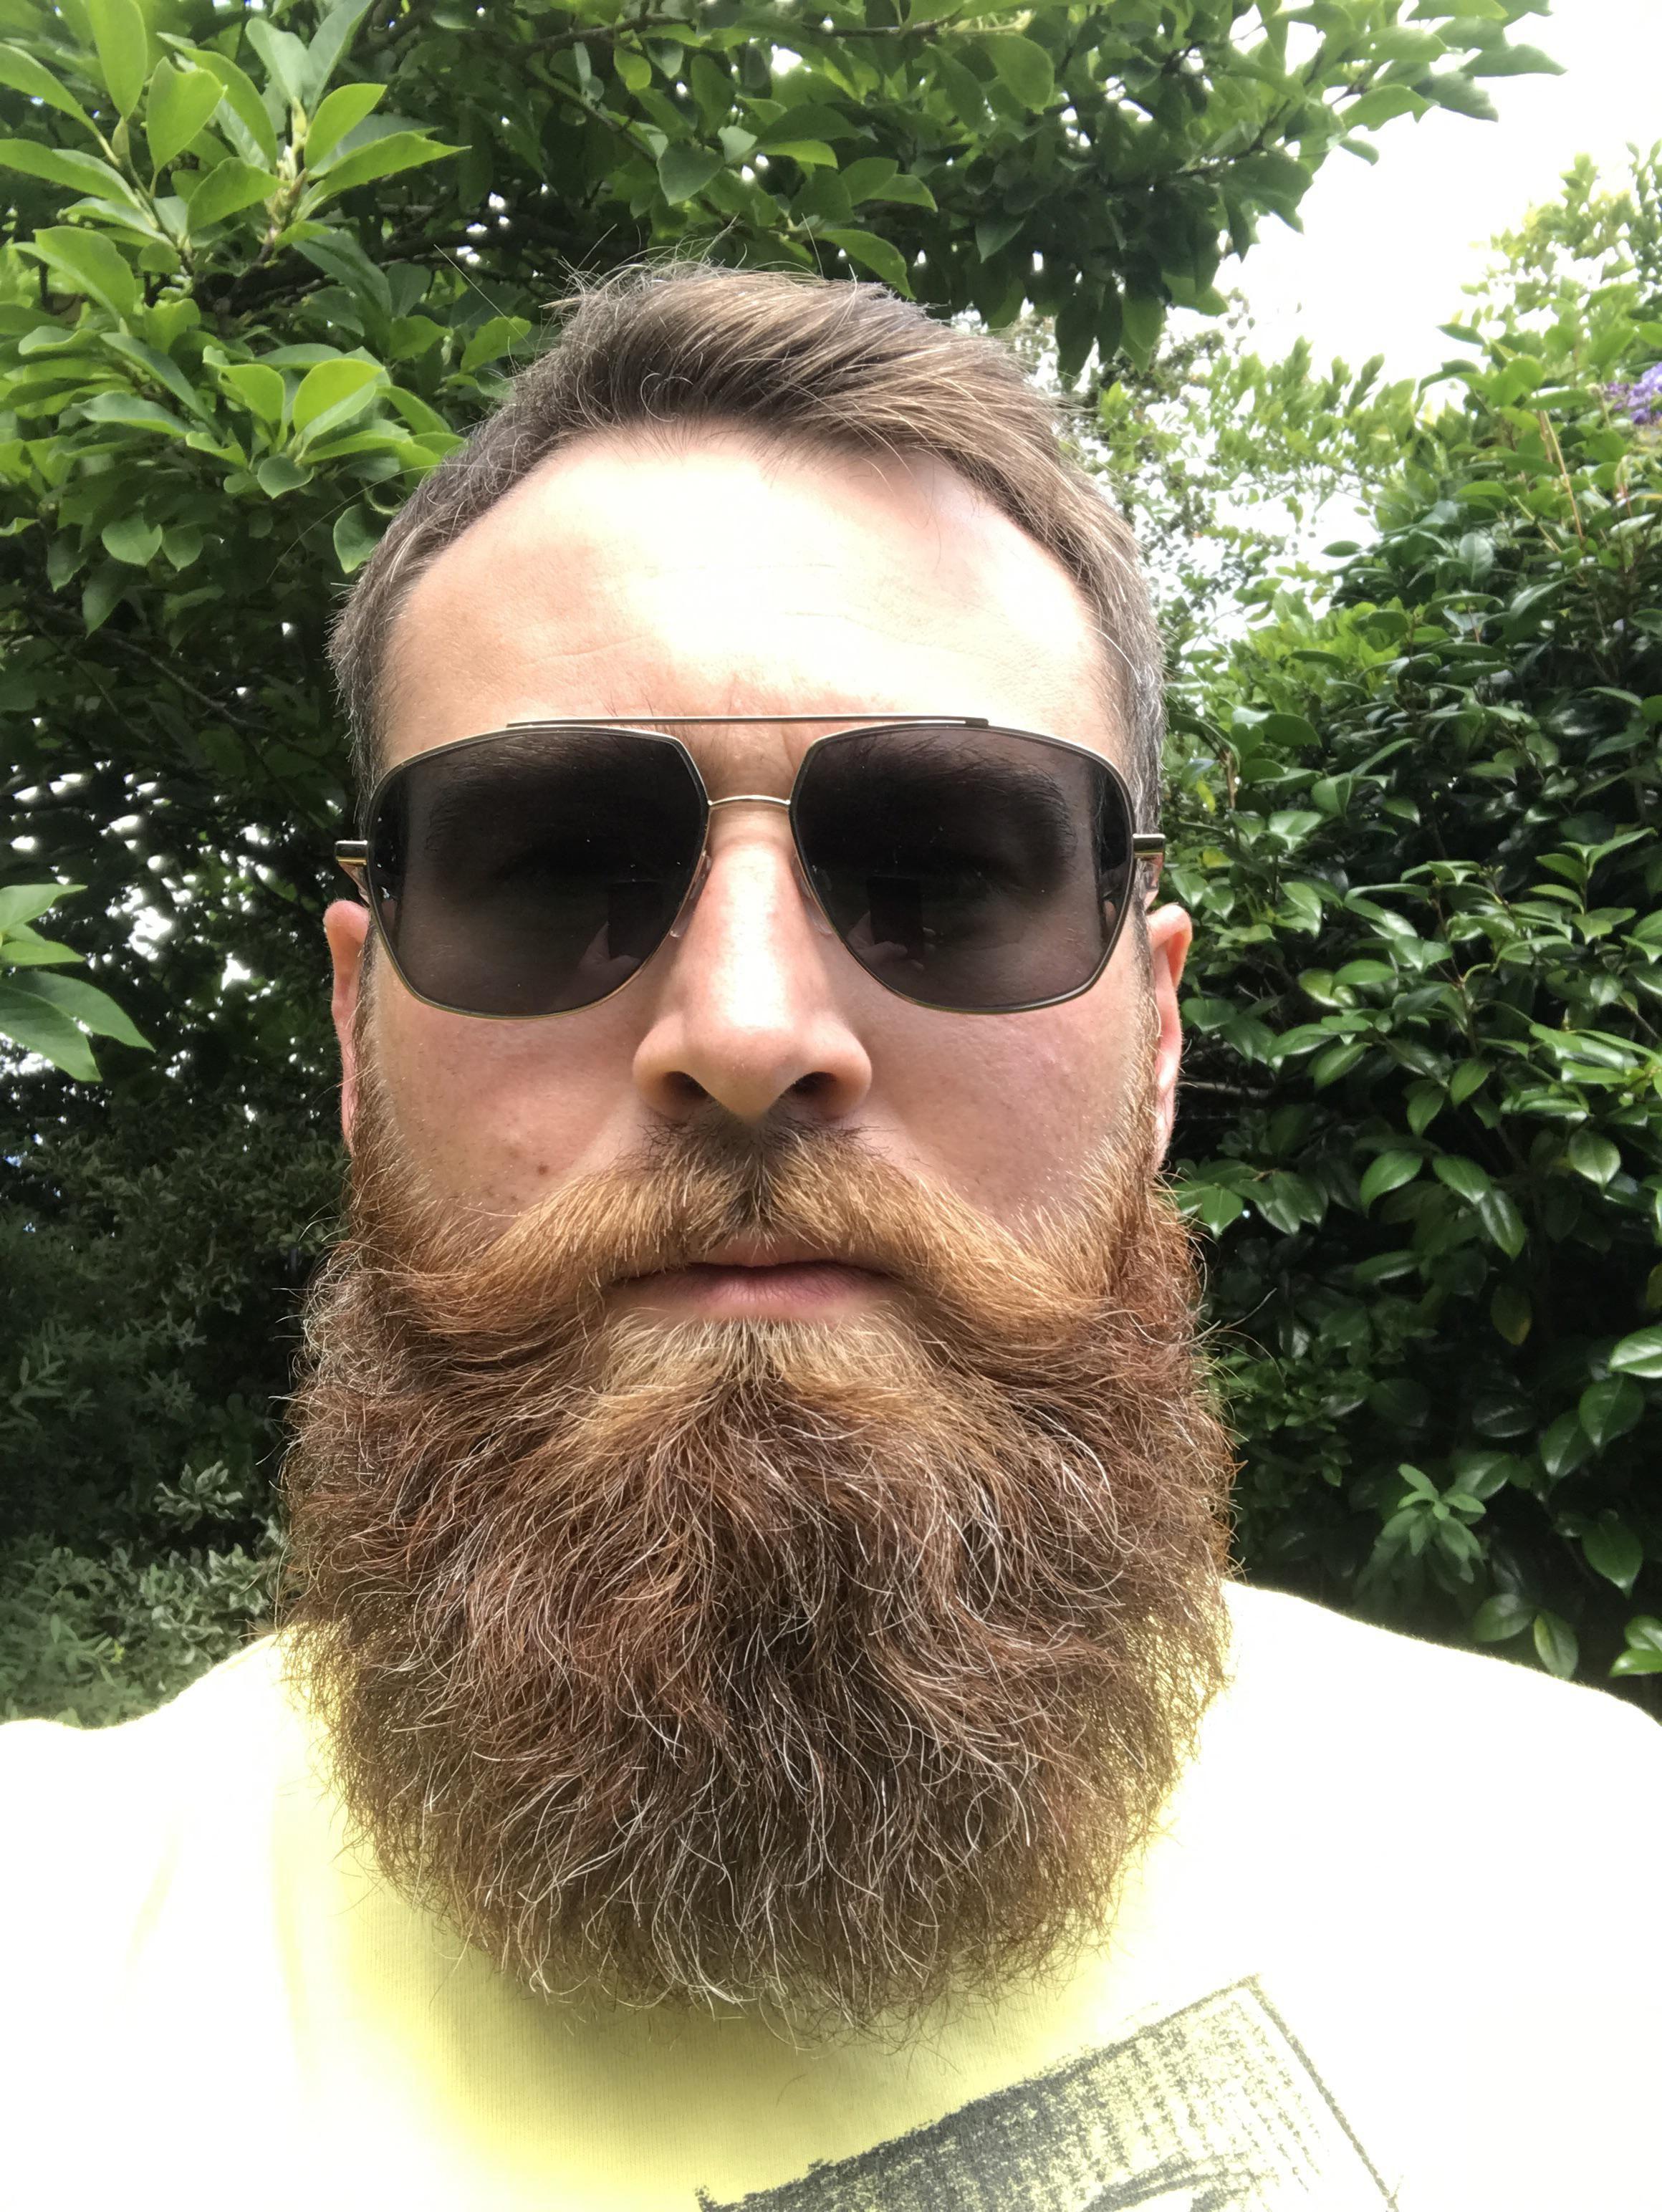 Having a good beard day beard best square sunglasses men